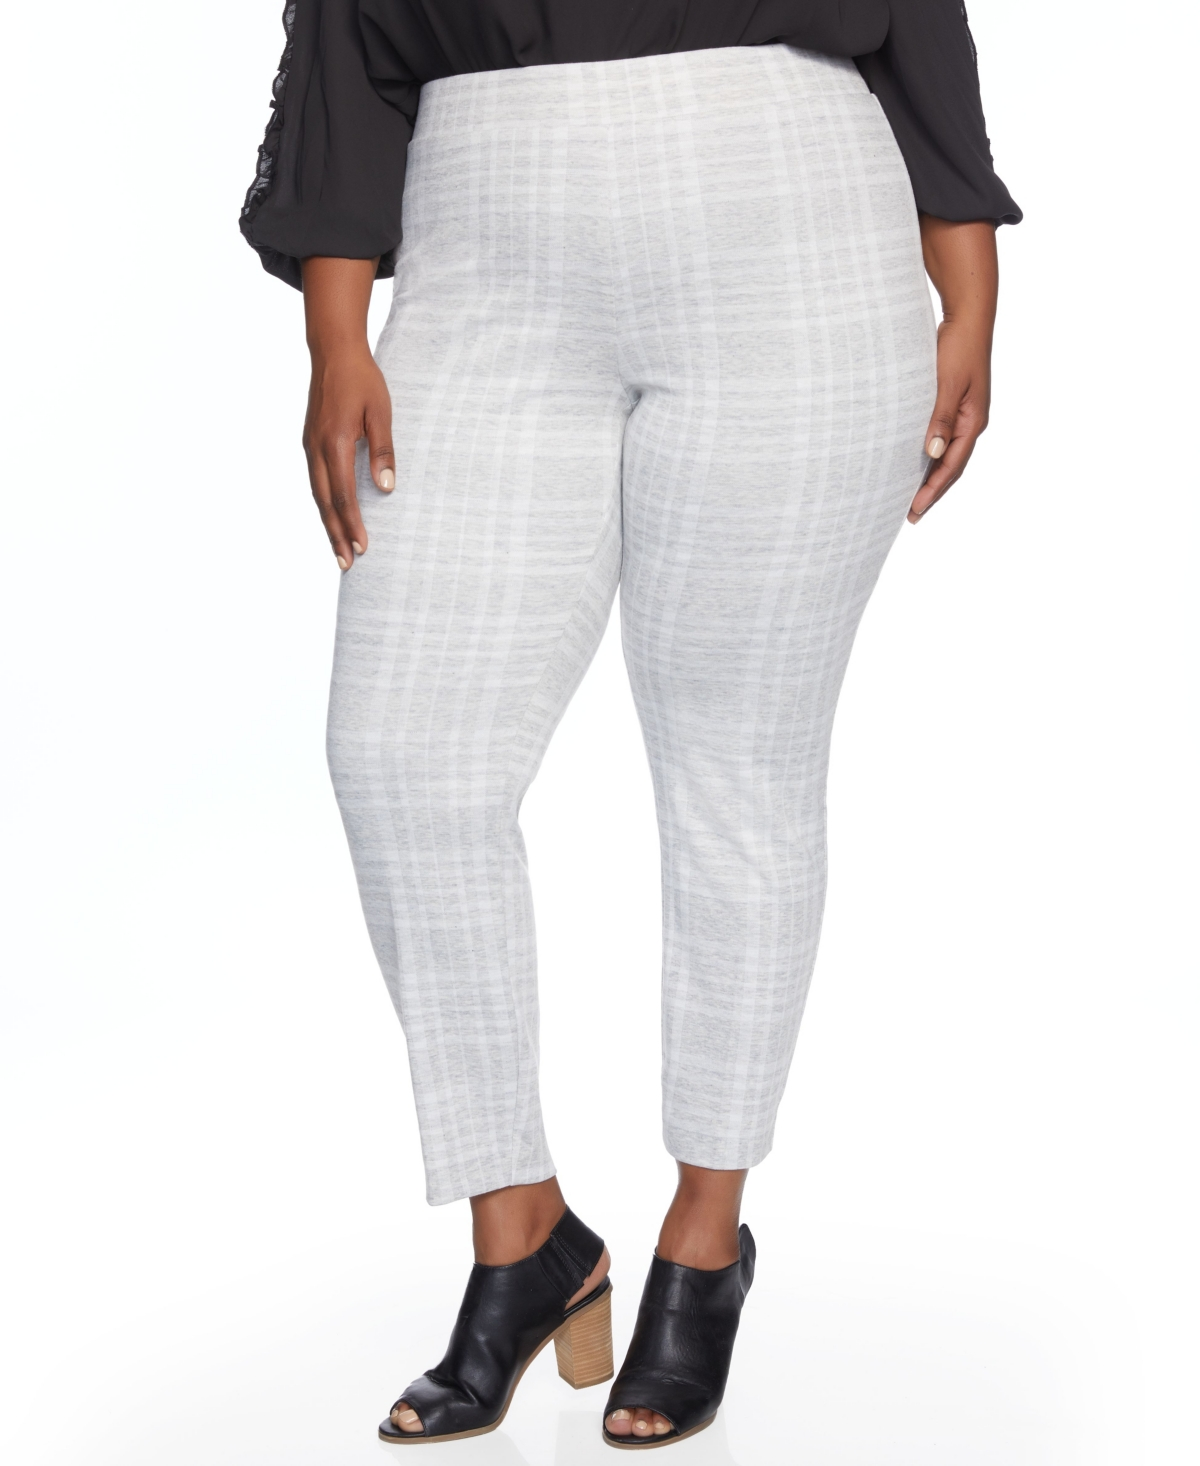 Plus Size Waistband Skinny Pant